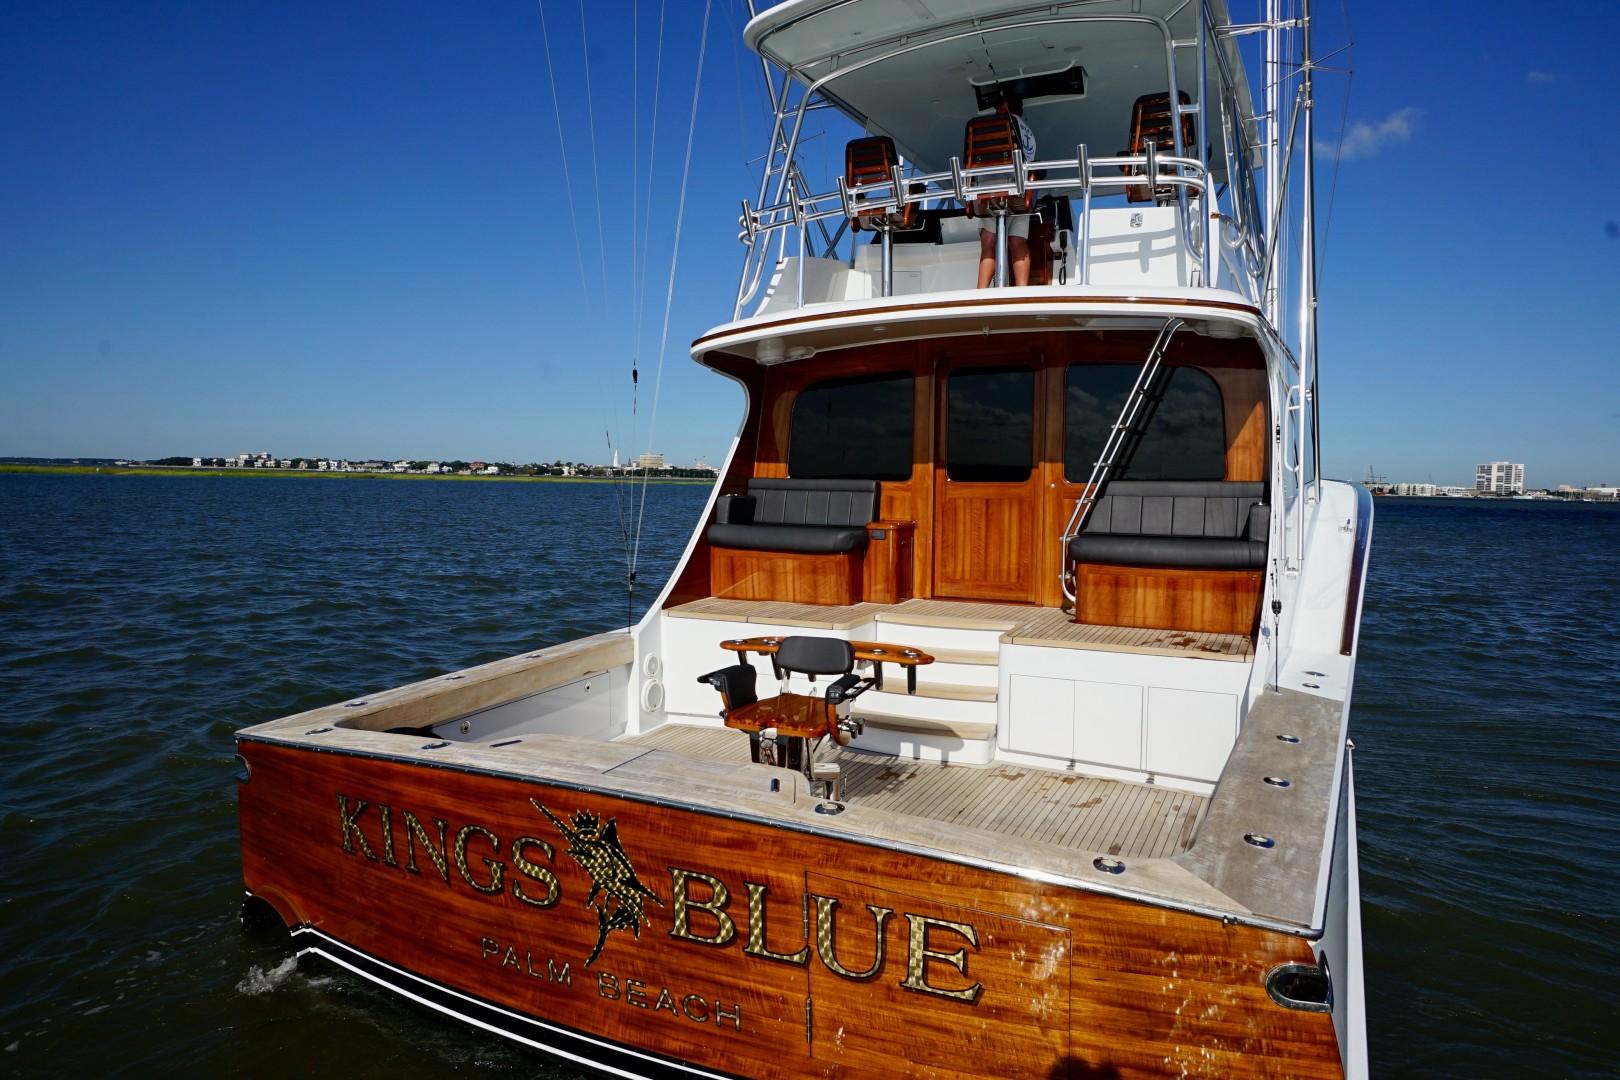 Whiticar 77 - Kings Blue - stern profile